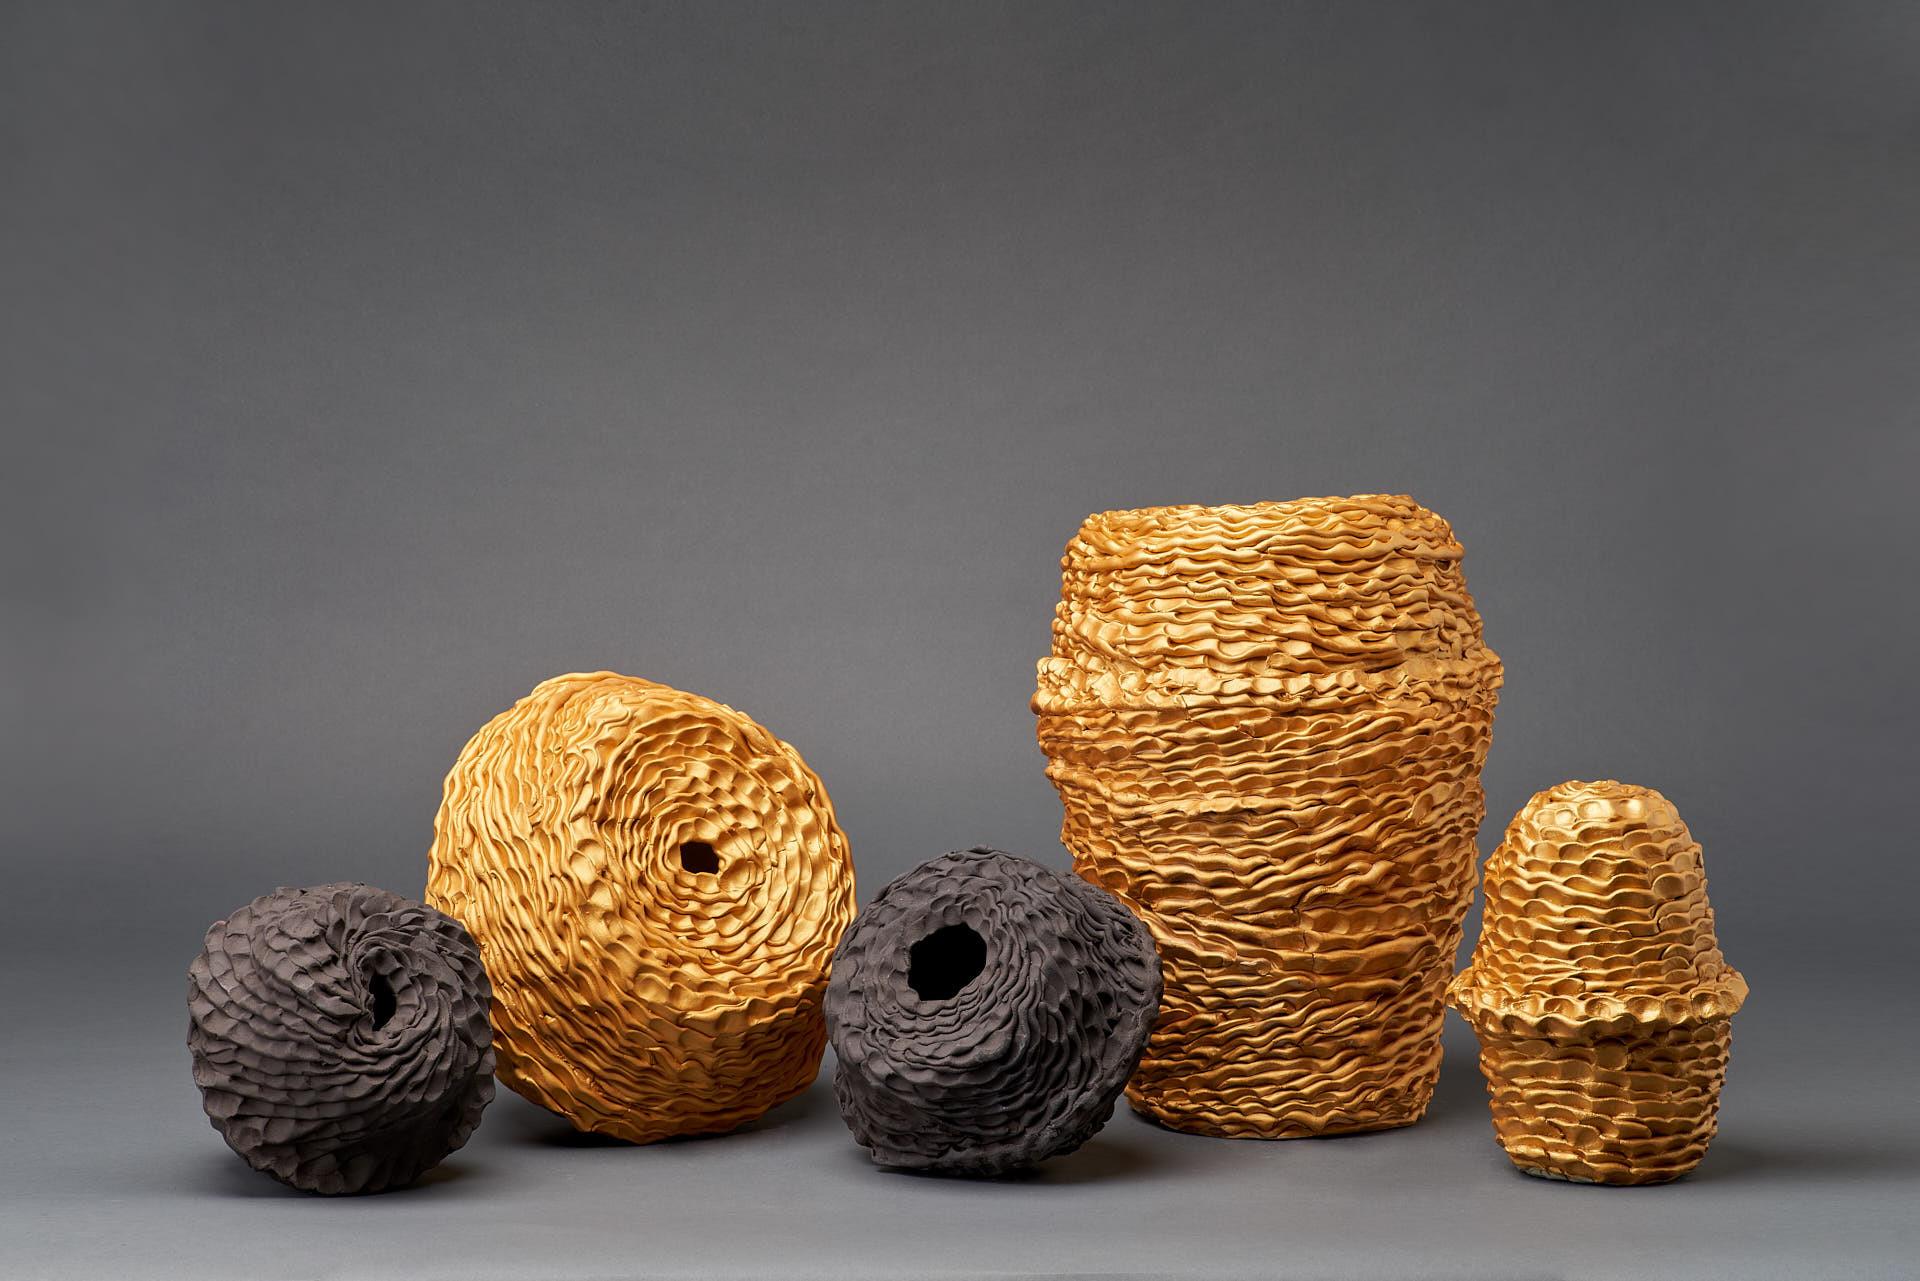 Sam Gold, Stillness votive vessel series, 2020, Gold onglaze, porcelain and stoneware